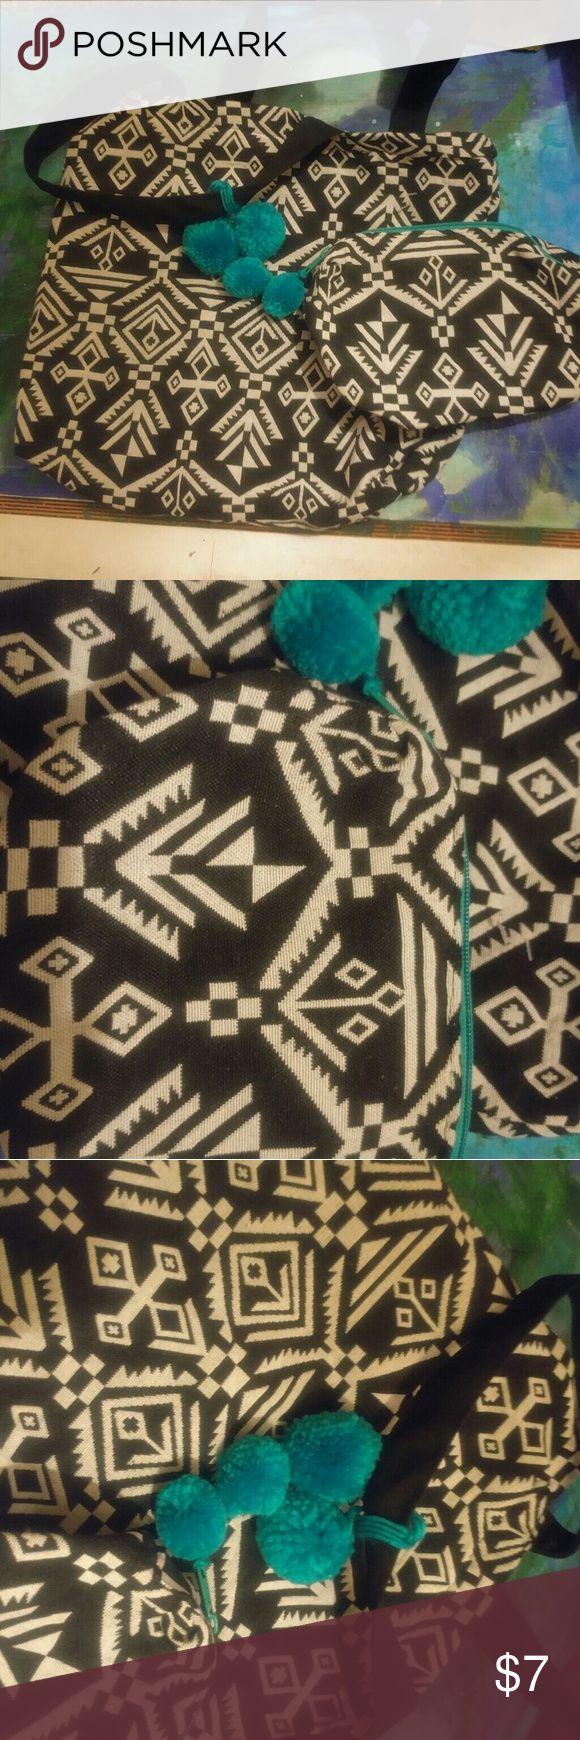 Aztec bags Aztec tote bag and matching makeup bag Bags